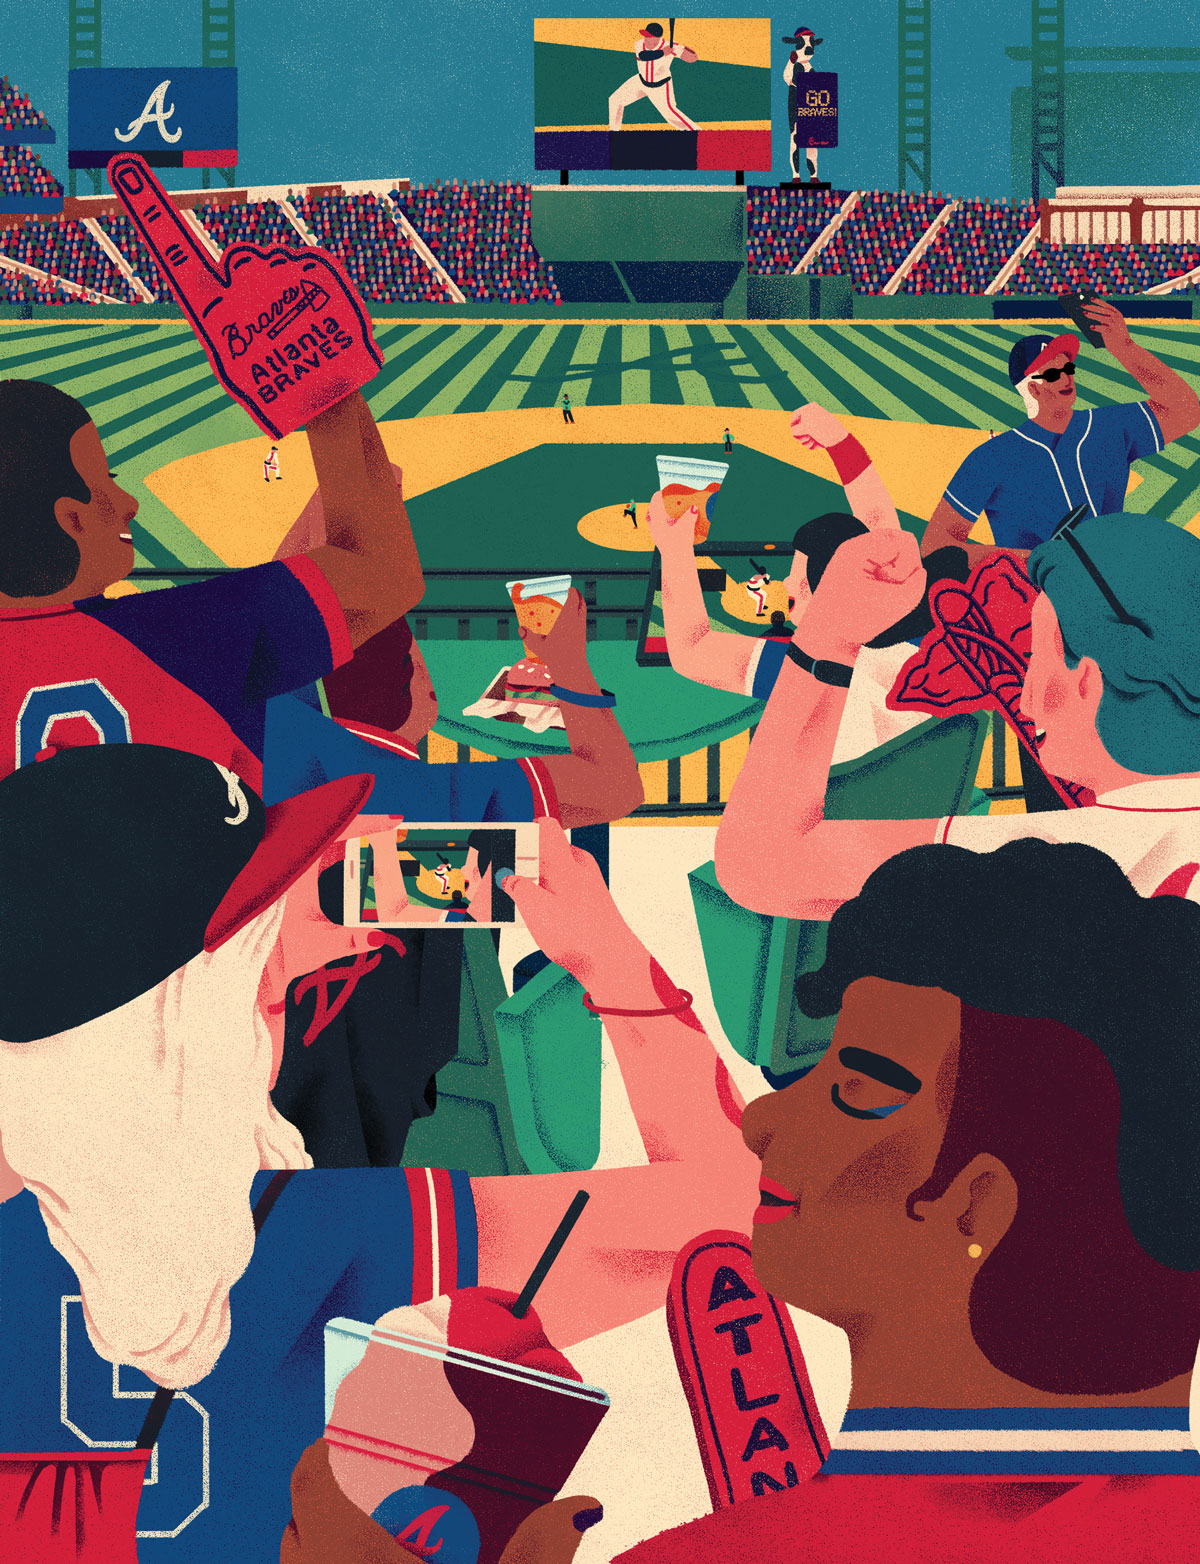 Braves SunTrust Park graphic